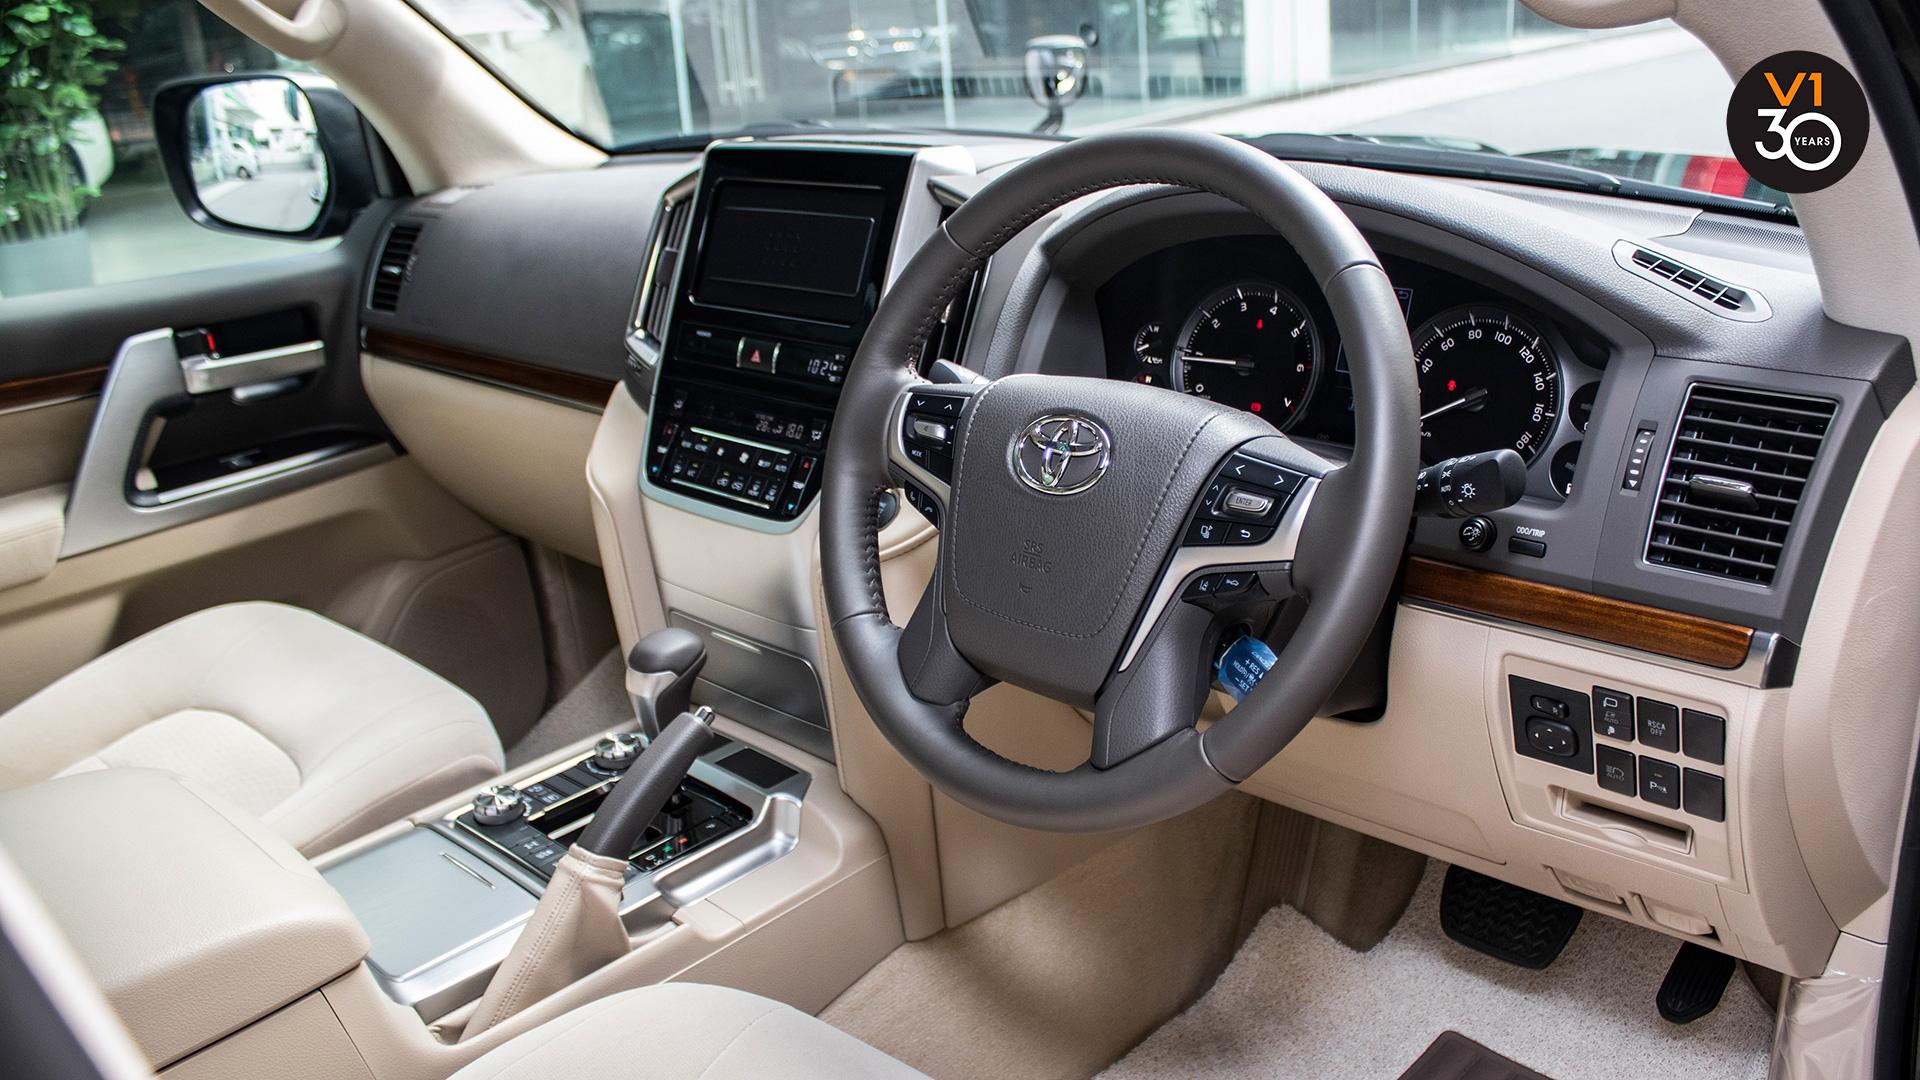 Toyota Land Cruiser 4.6 AXG (8-Seater) - Interior Dash